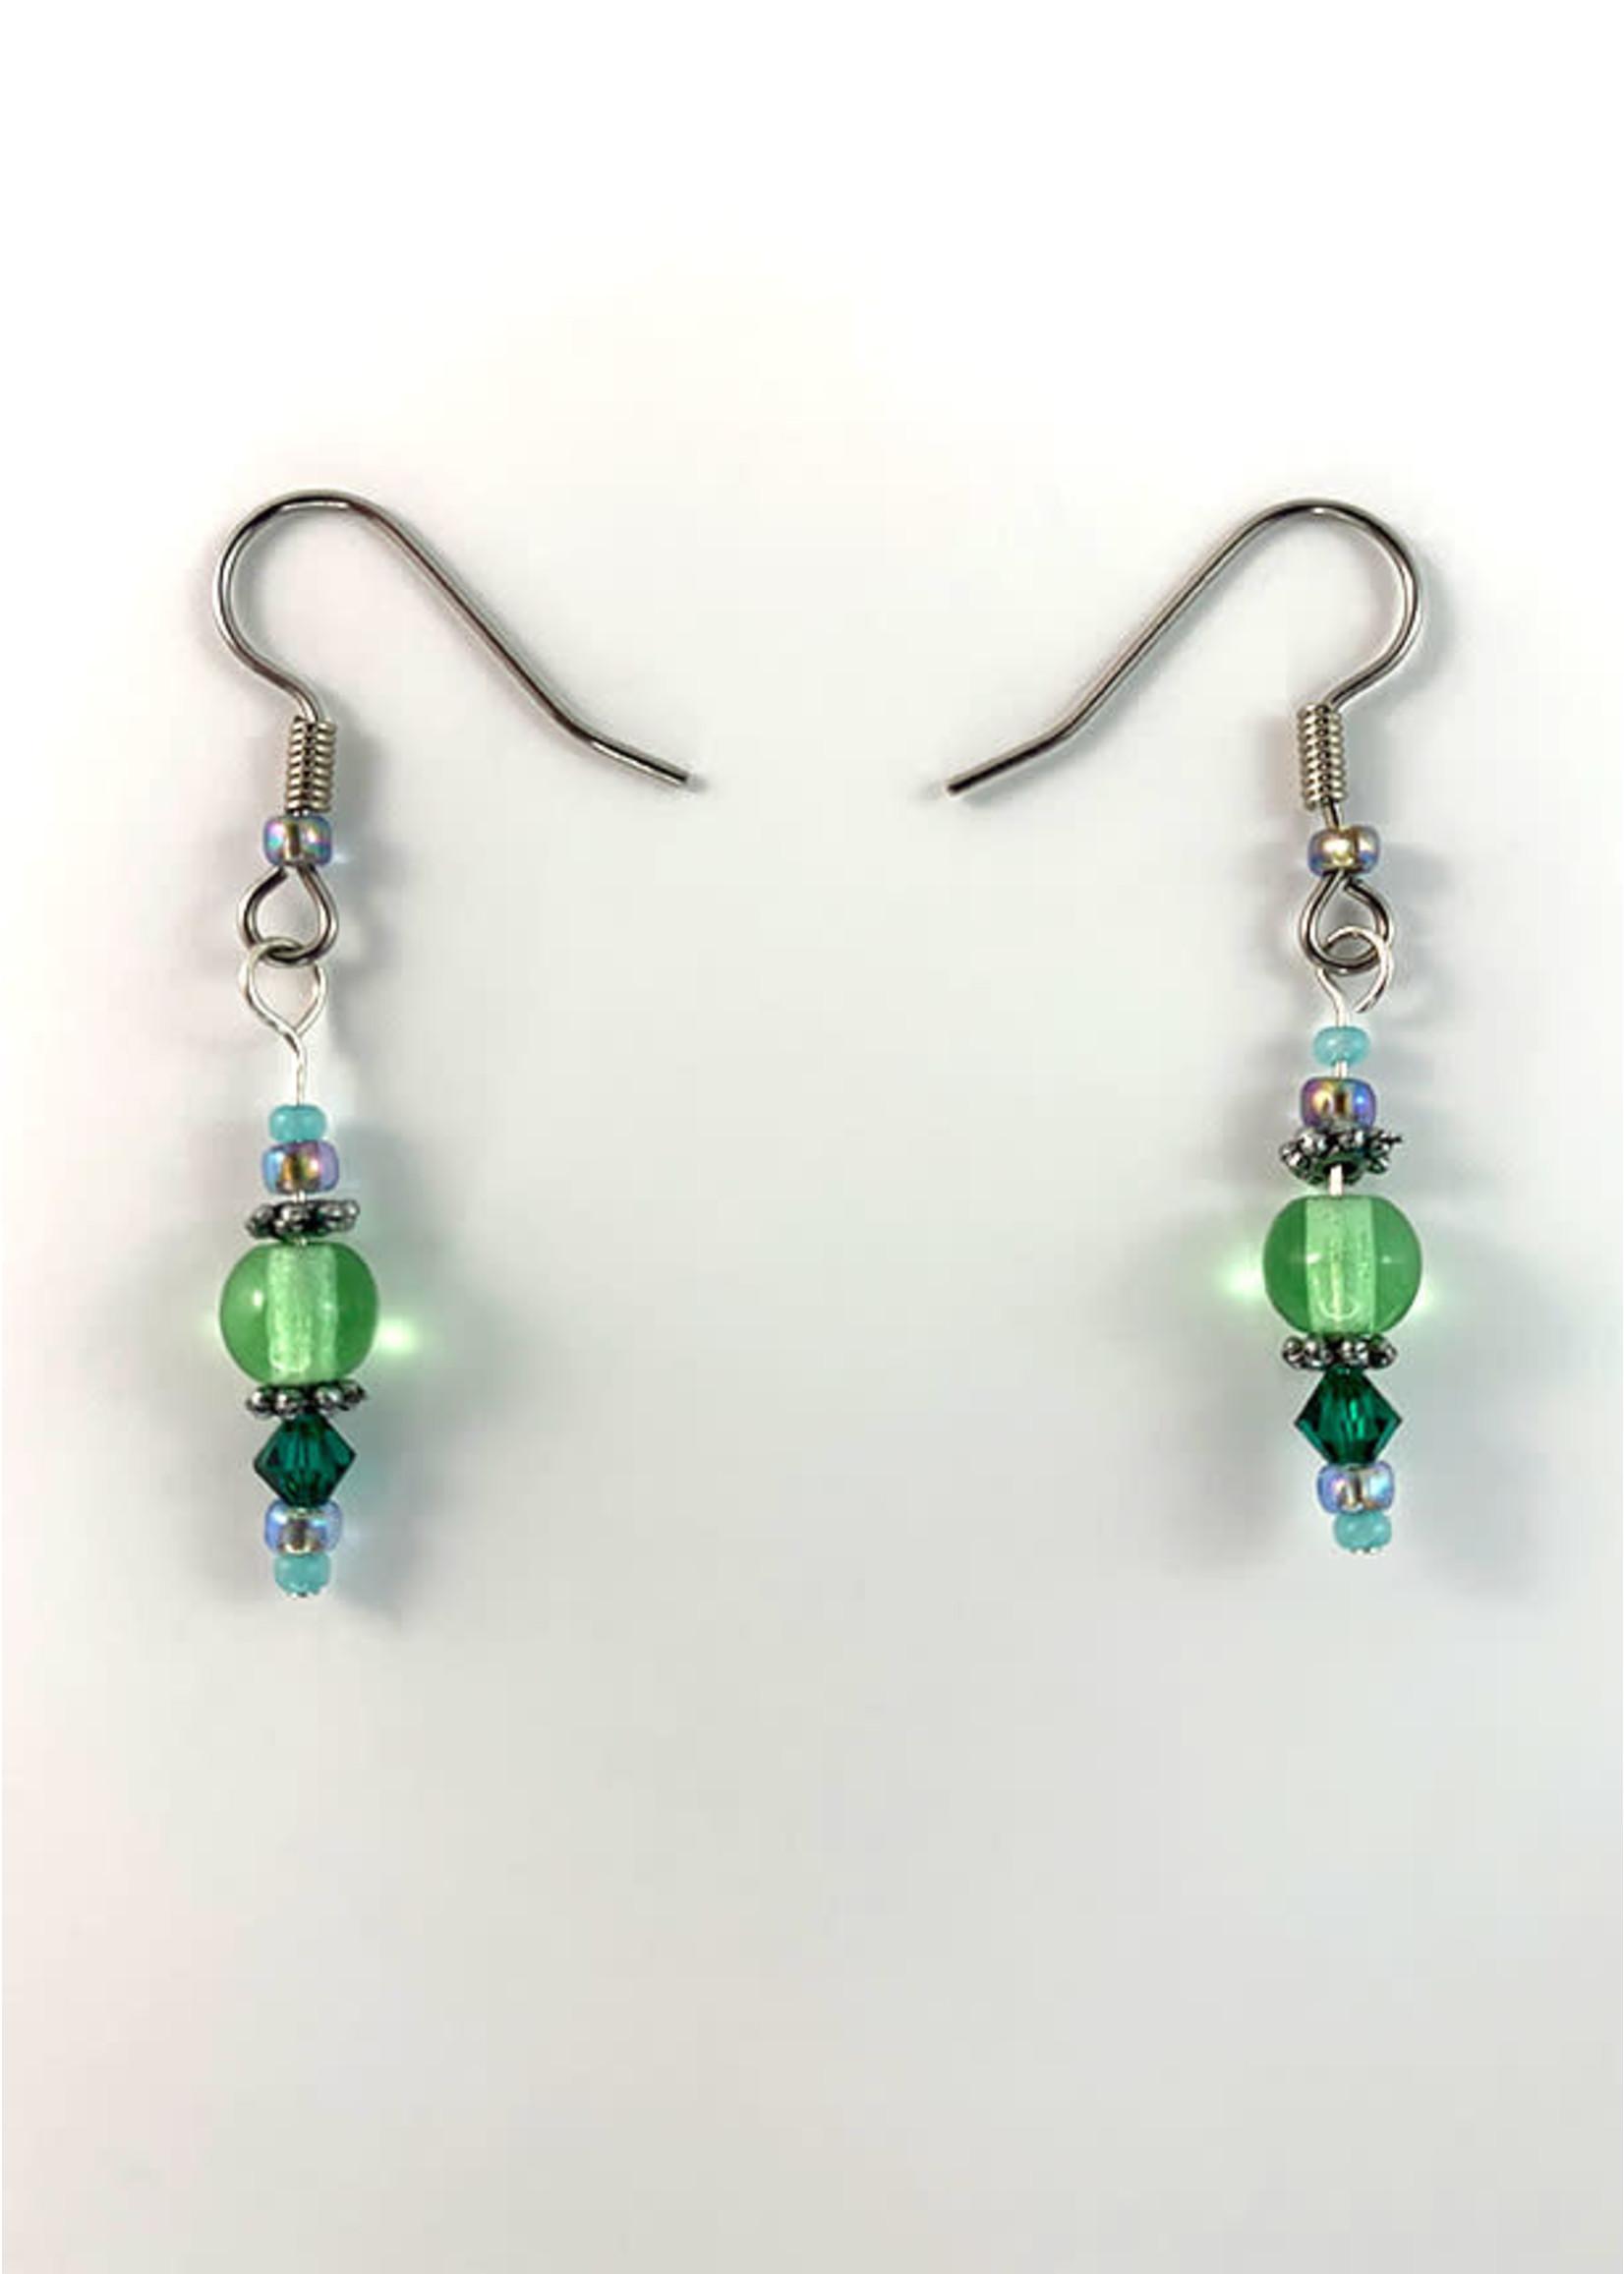 Circle of Eagles Beaded Earrings - Green & Blue